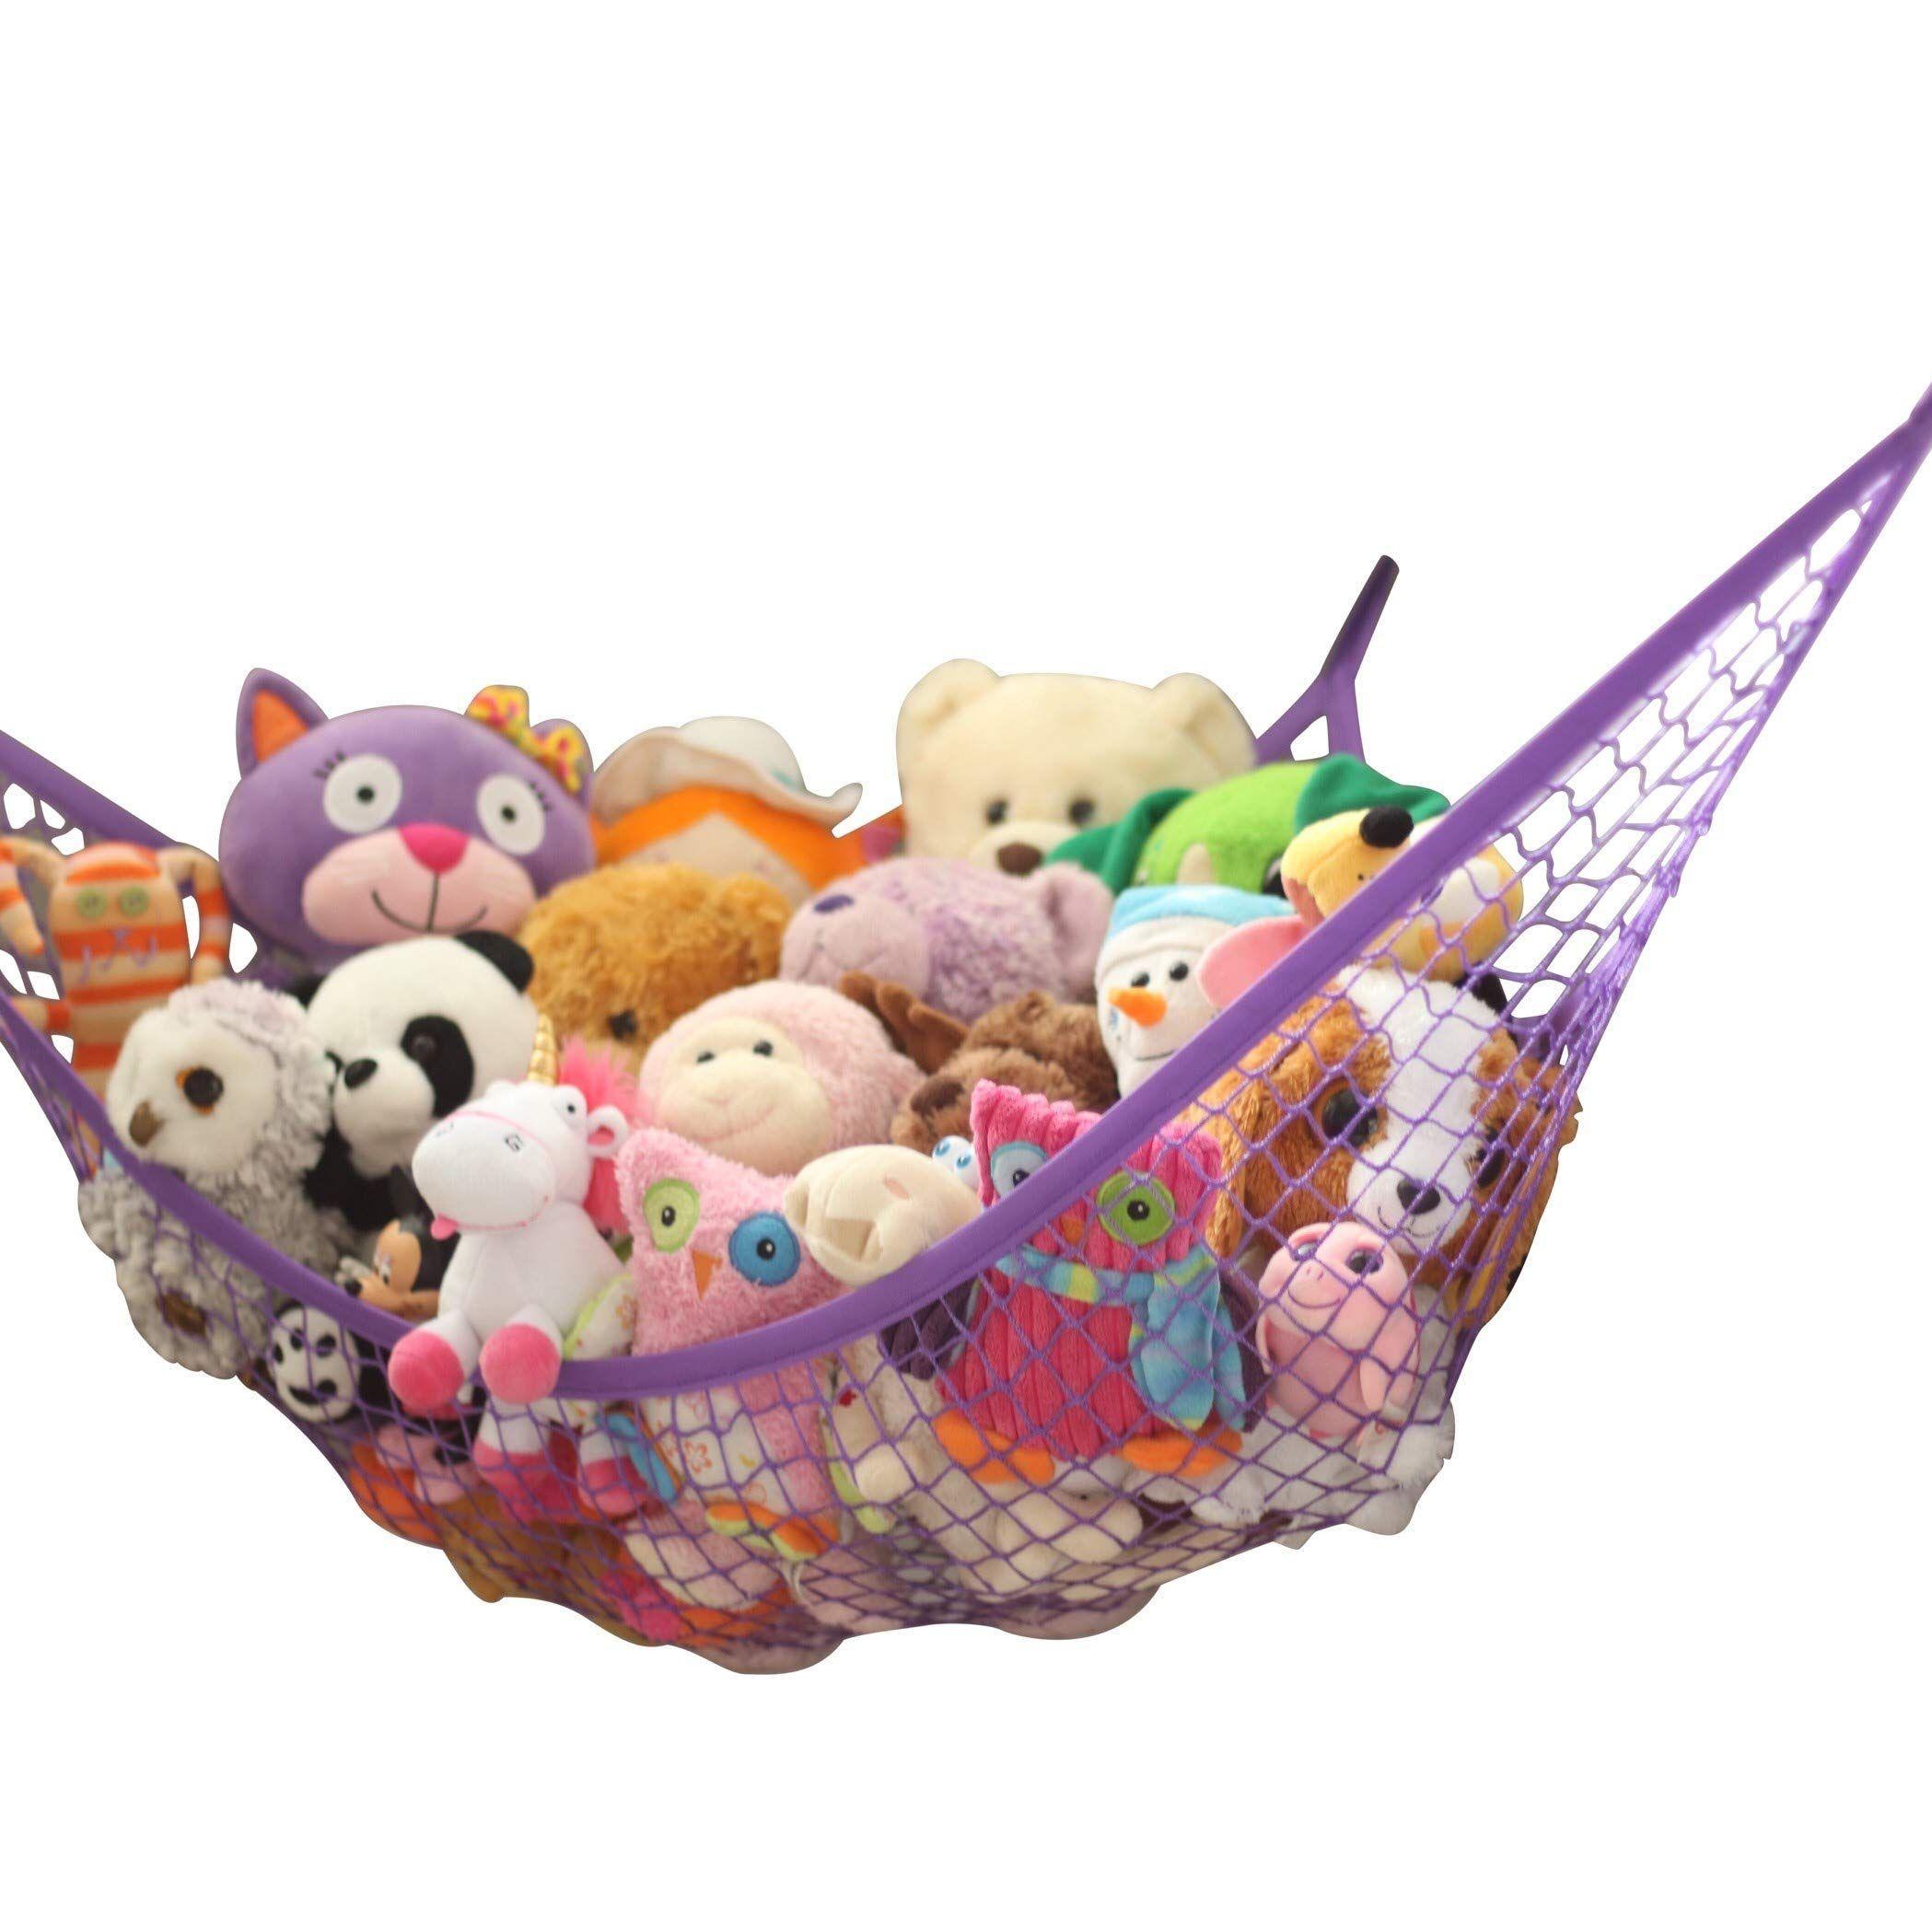 MiniOwls Toy Storage Hammock XLarge Organizer and De